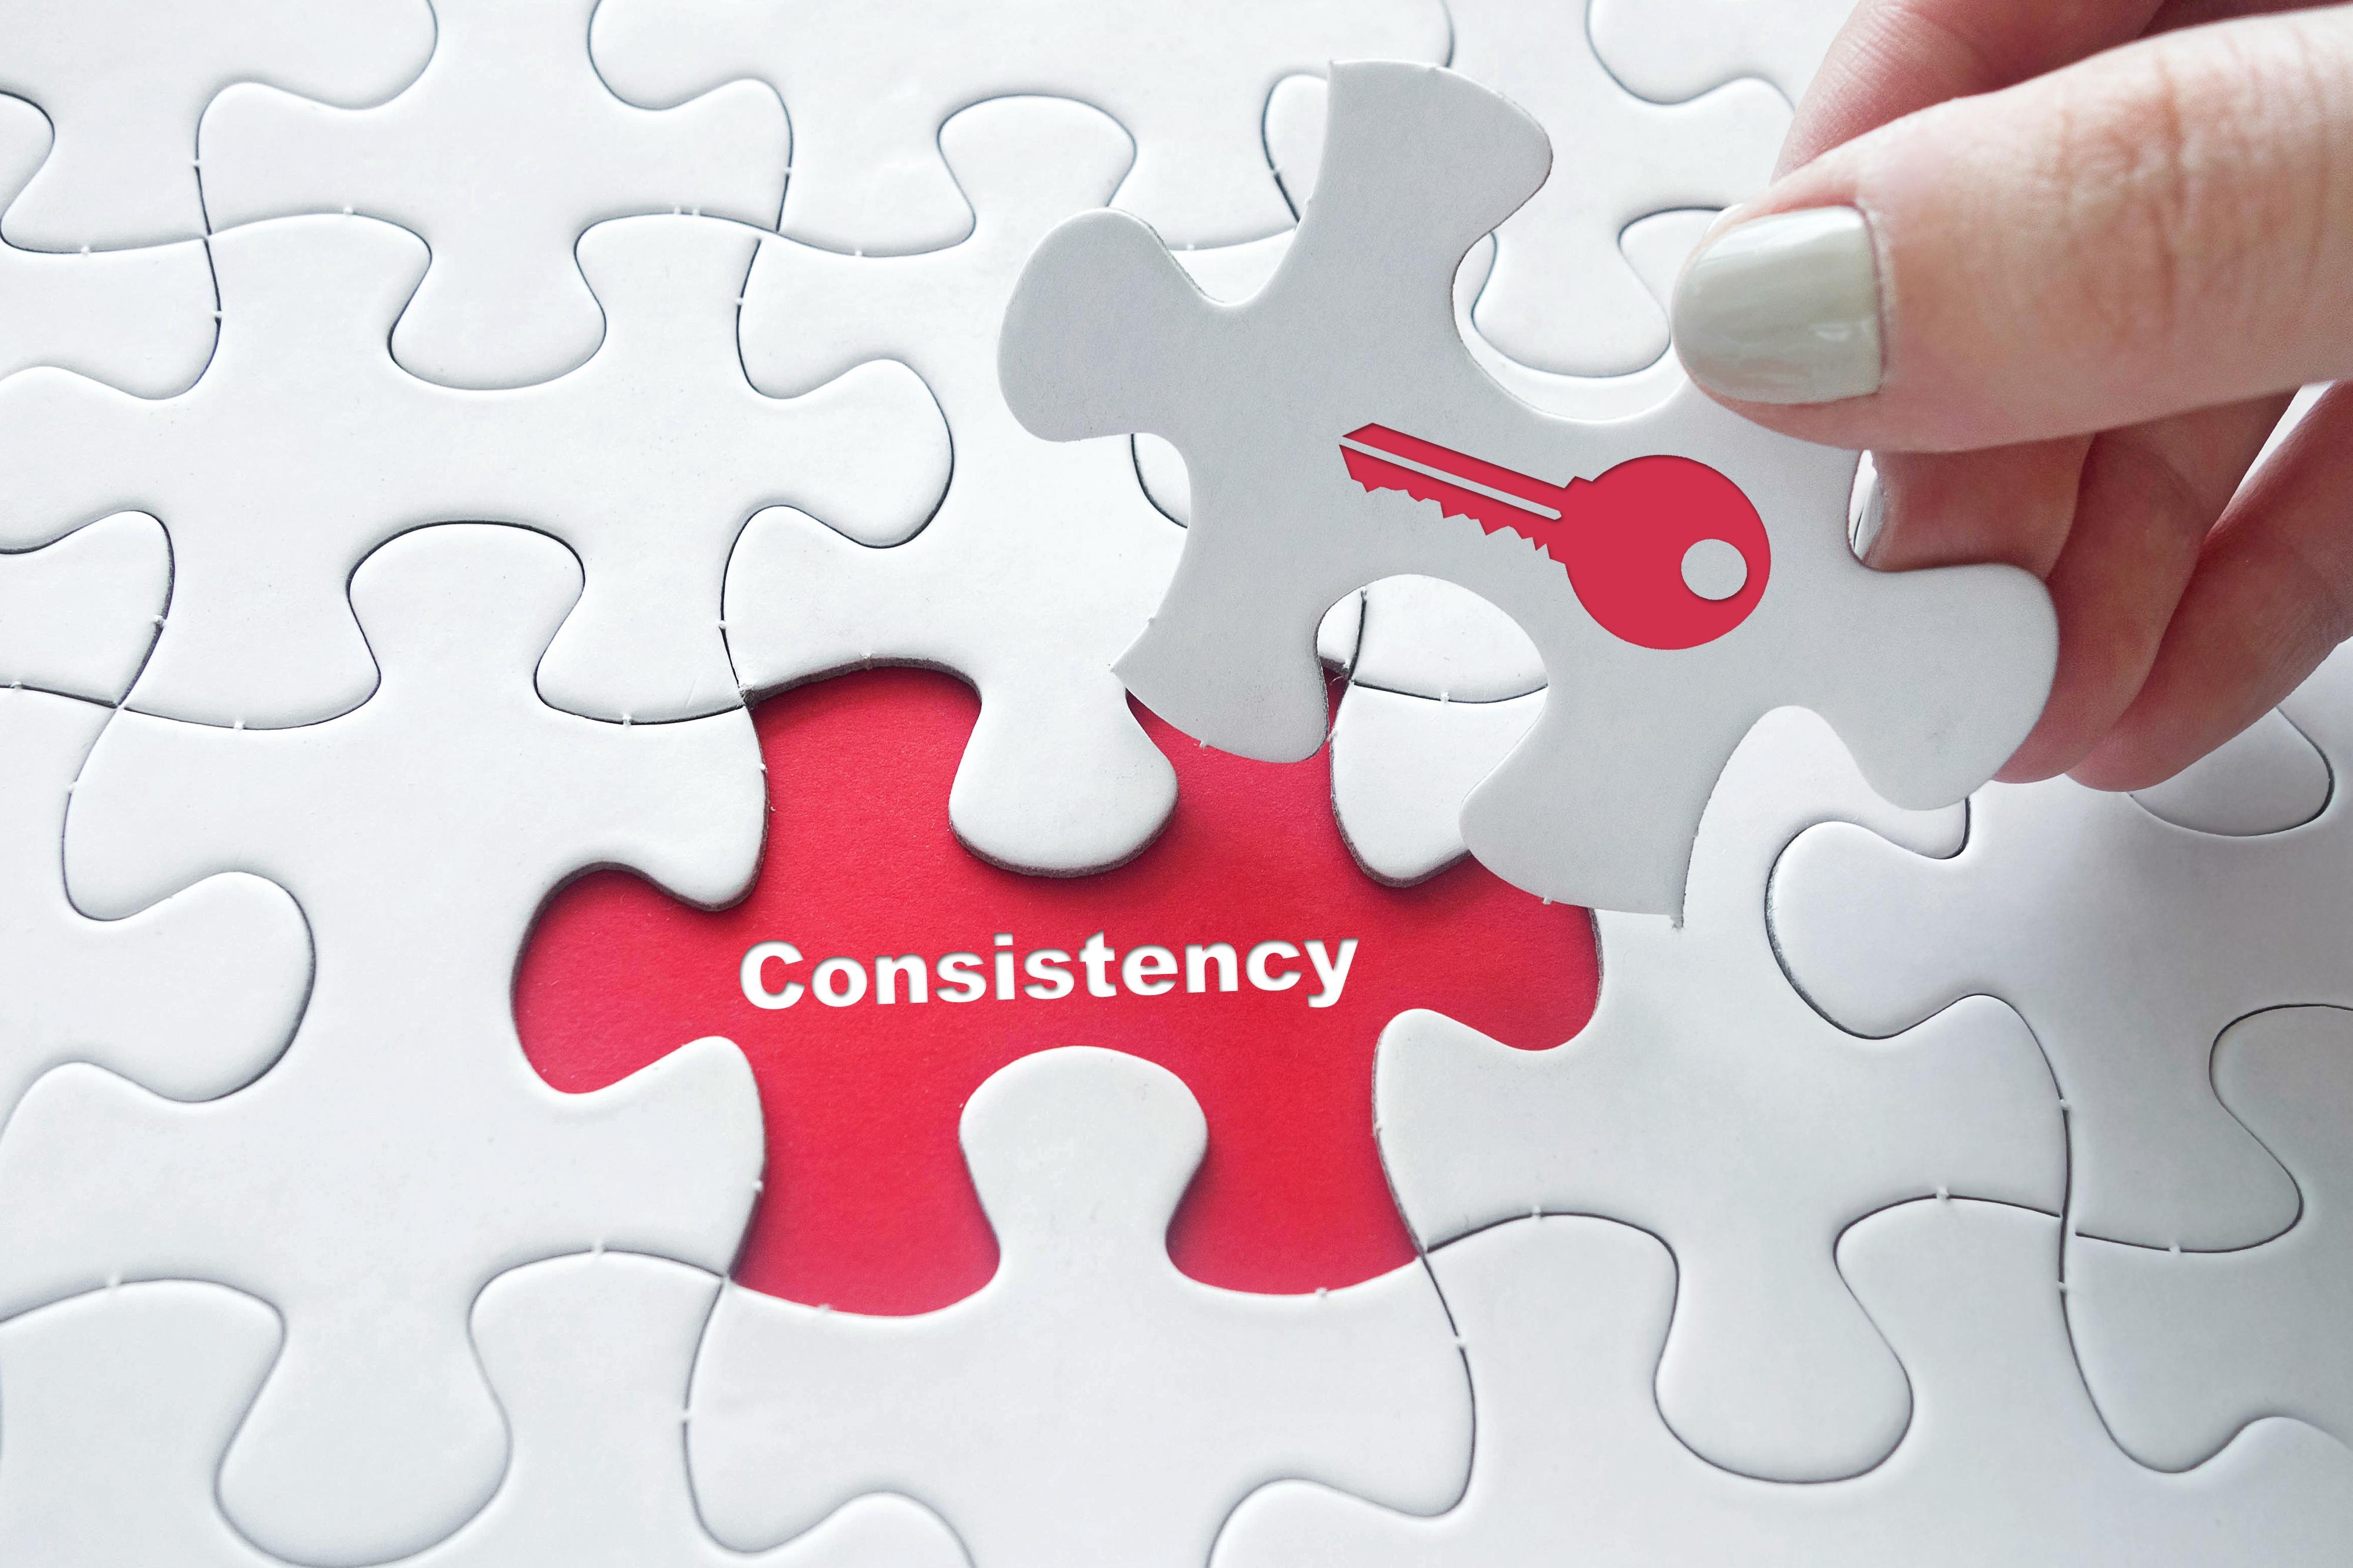 BrandsFormation-Consistency.jpg